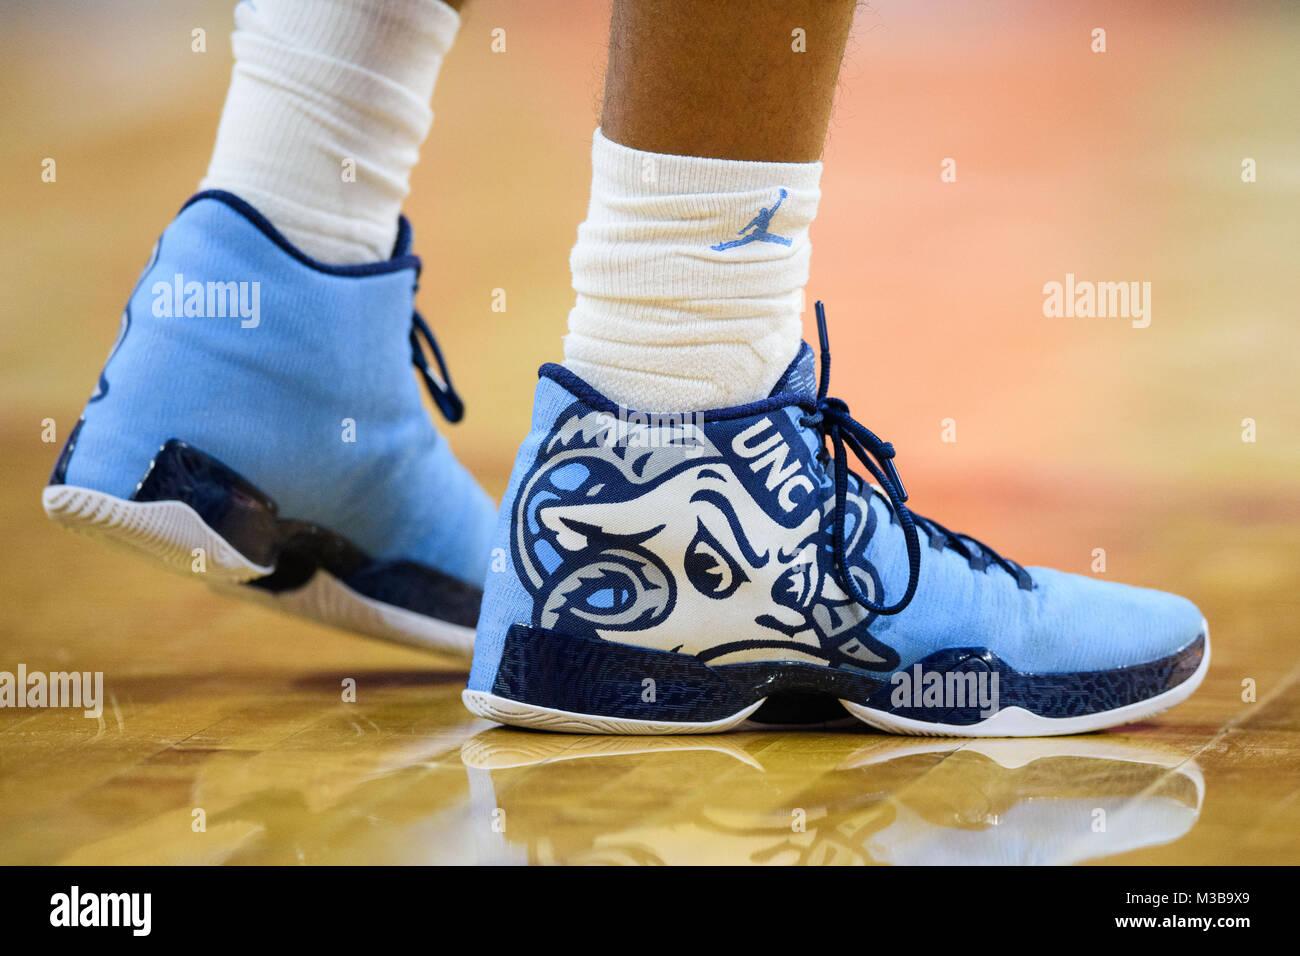 The shoes of North Carolina Tar Heels